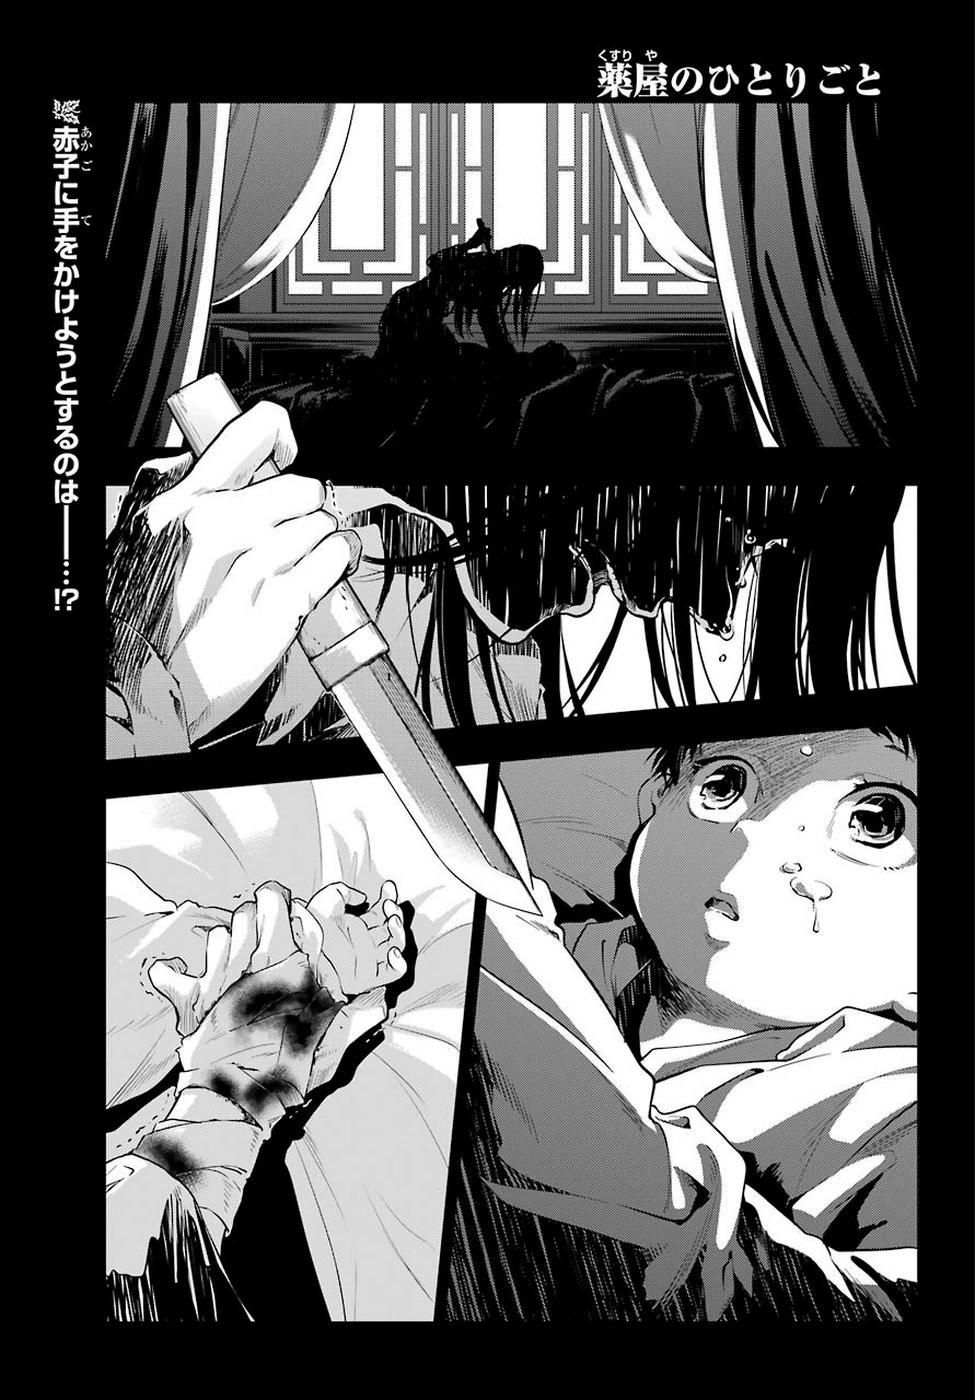 Kusuriya-no-Hitorigoto - Chapter 29 - Page 1